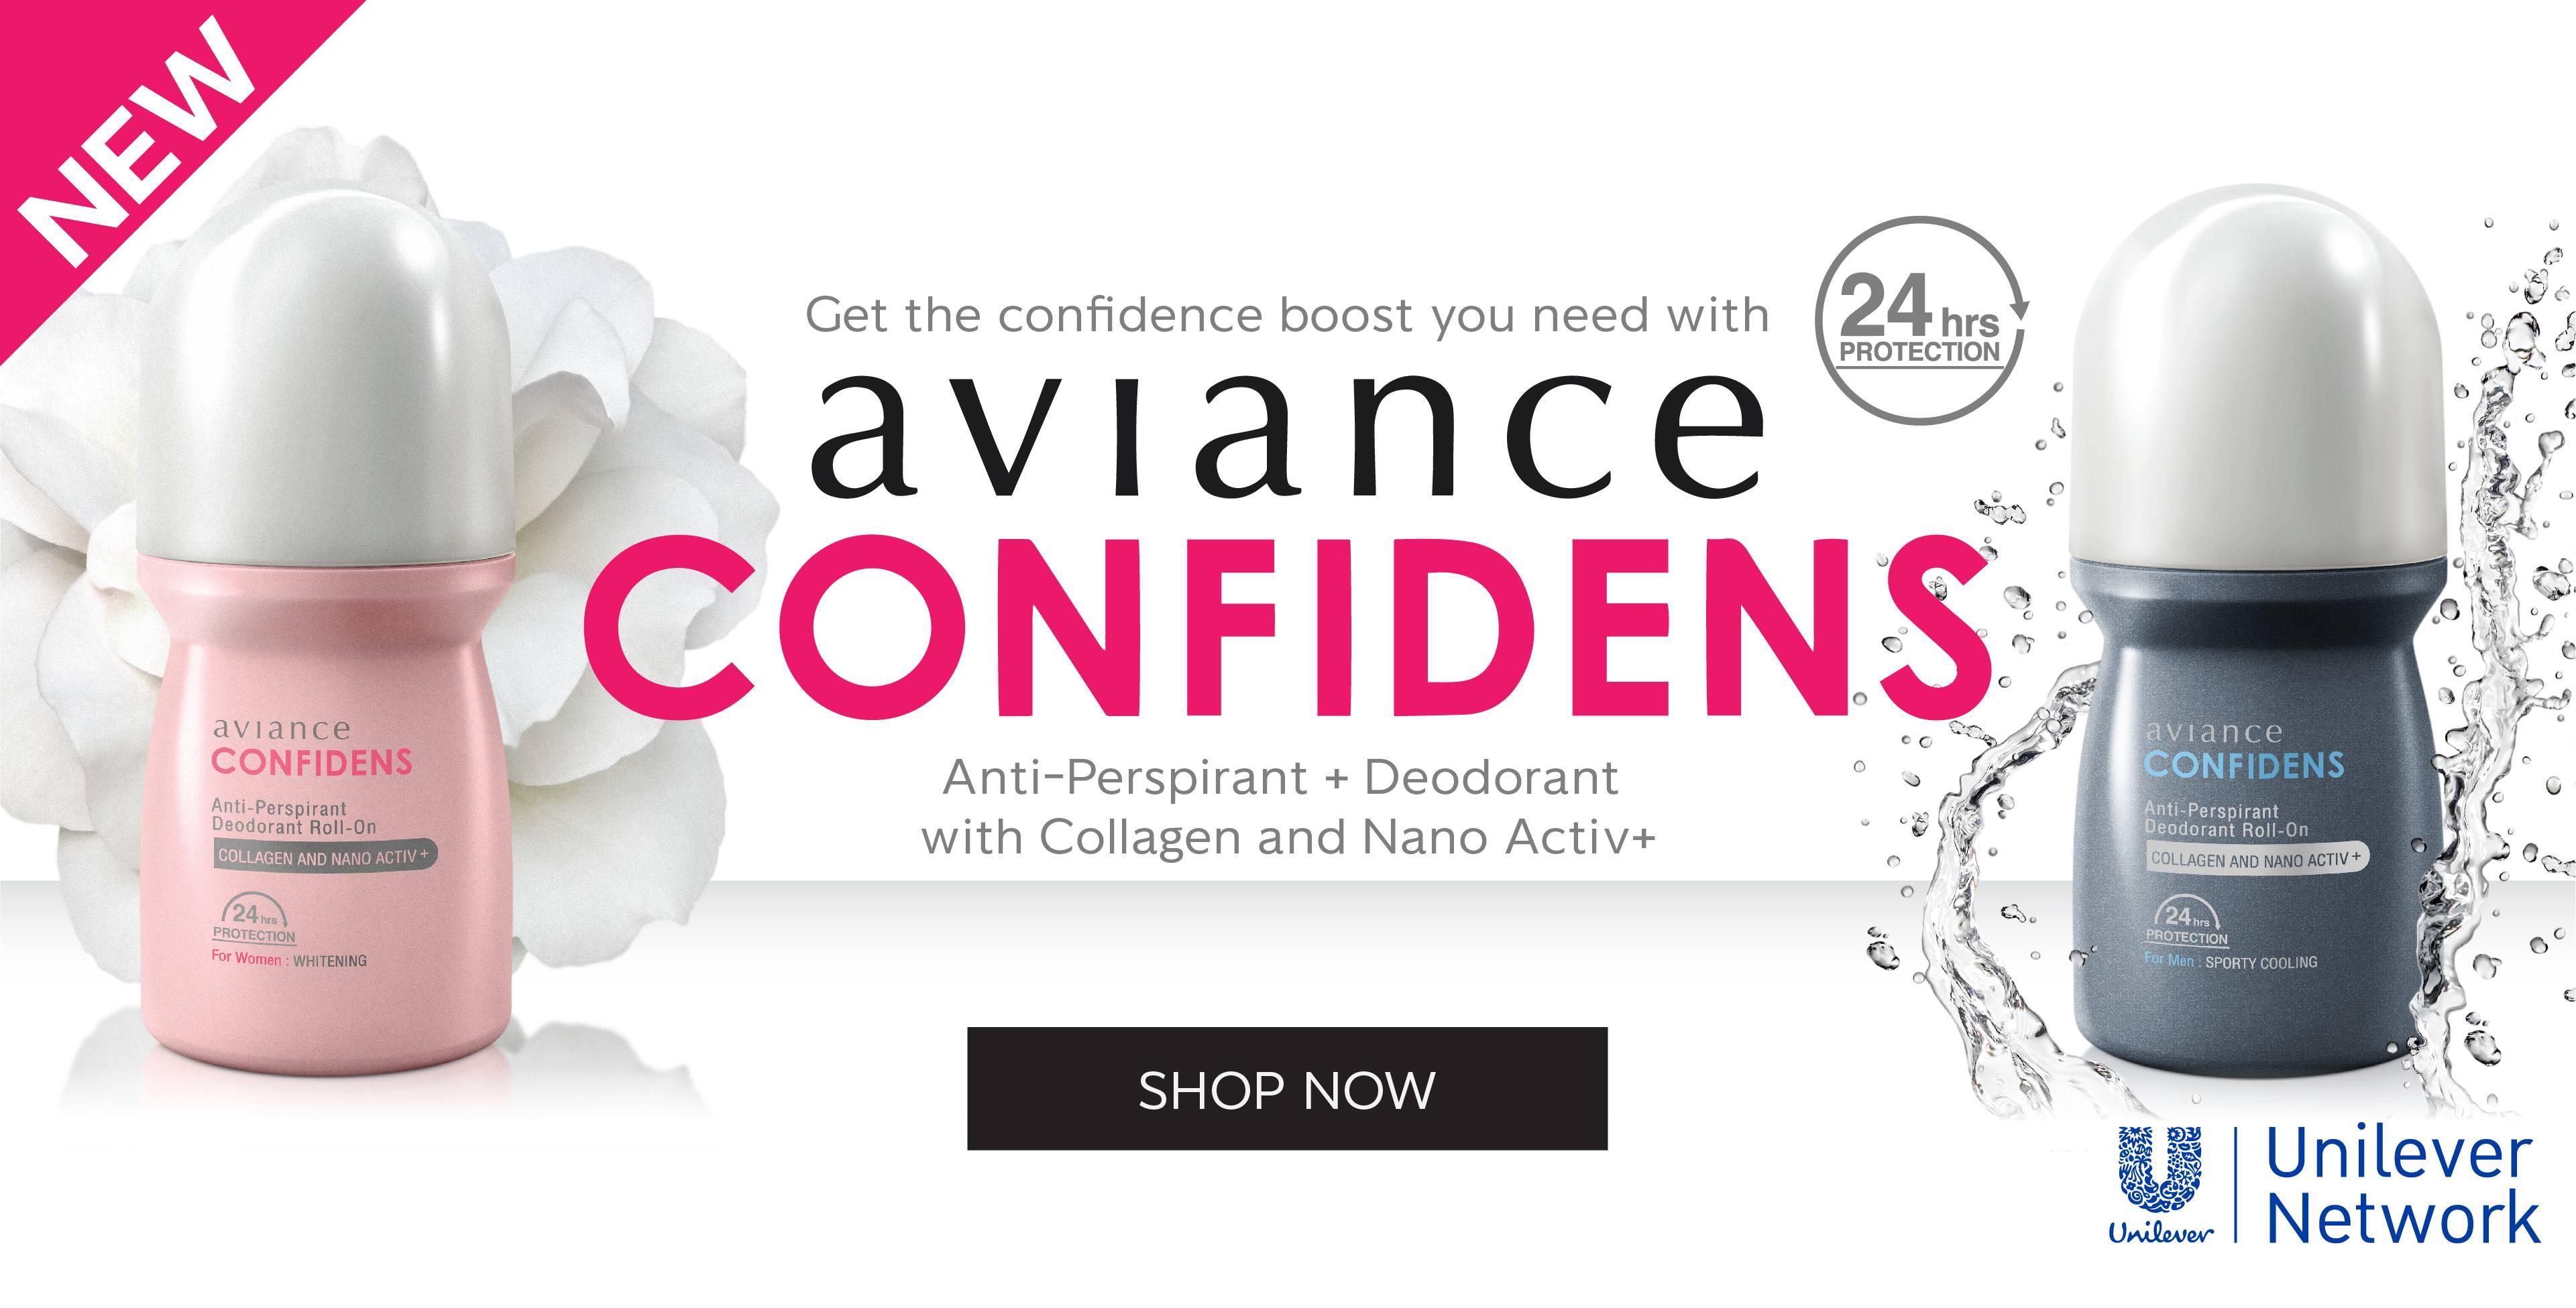 Newly Launch Confidens for Men & Women